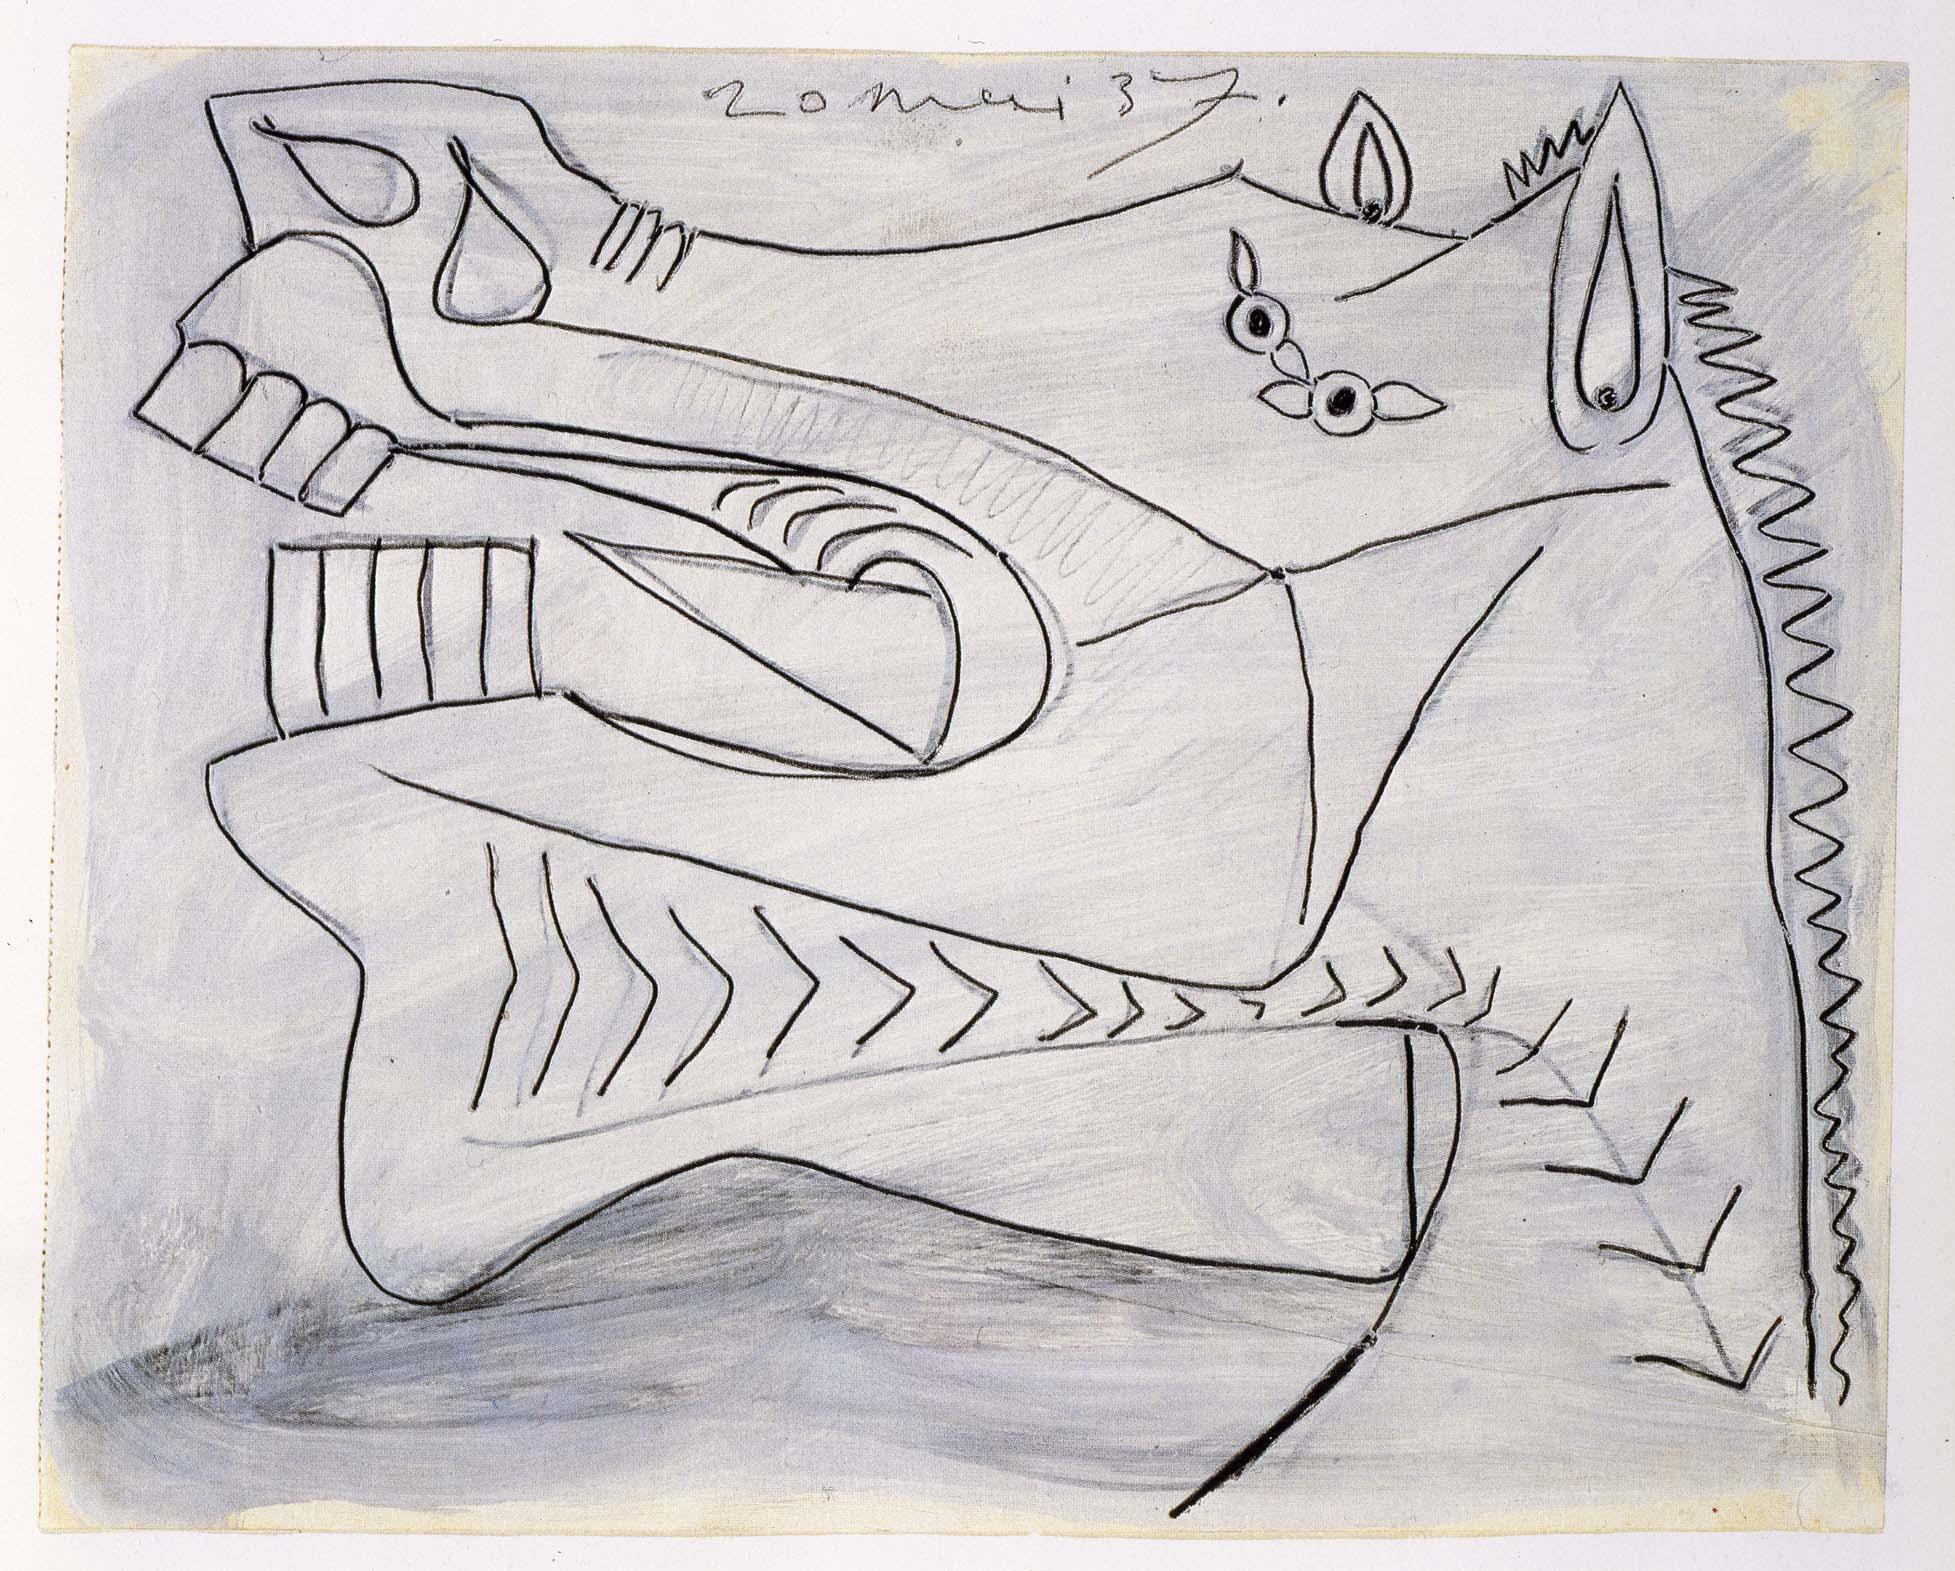 Picasso Guernica Sketches | www.pixshark.com - Images ...